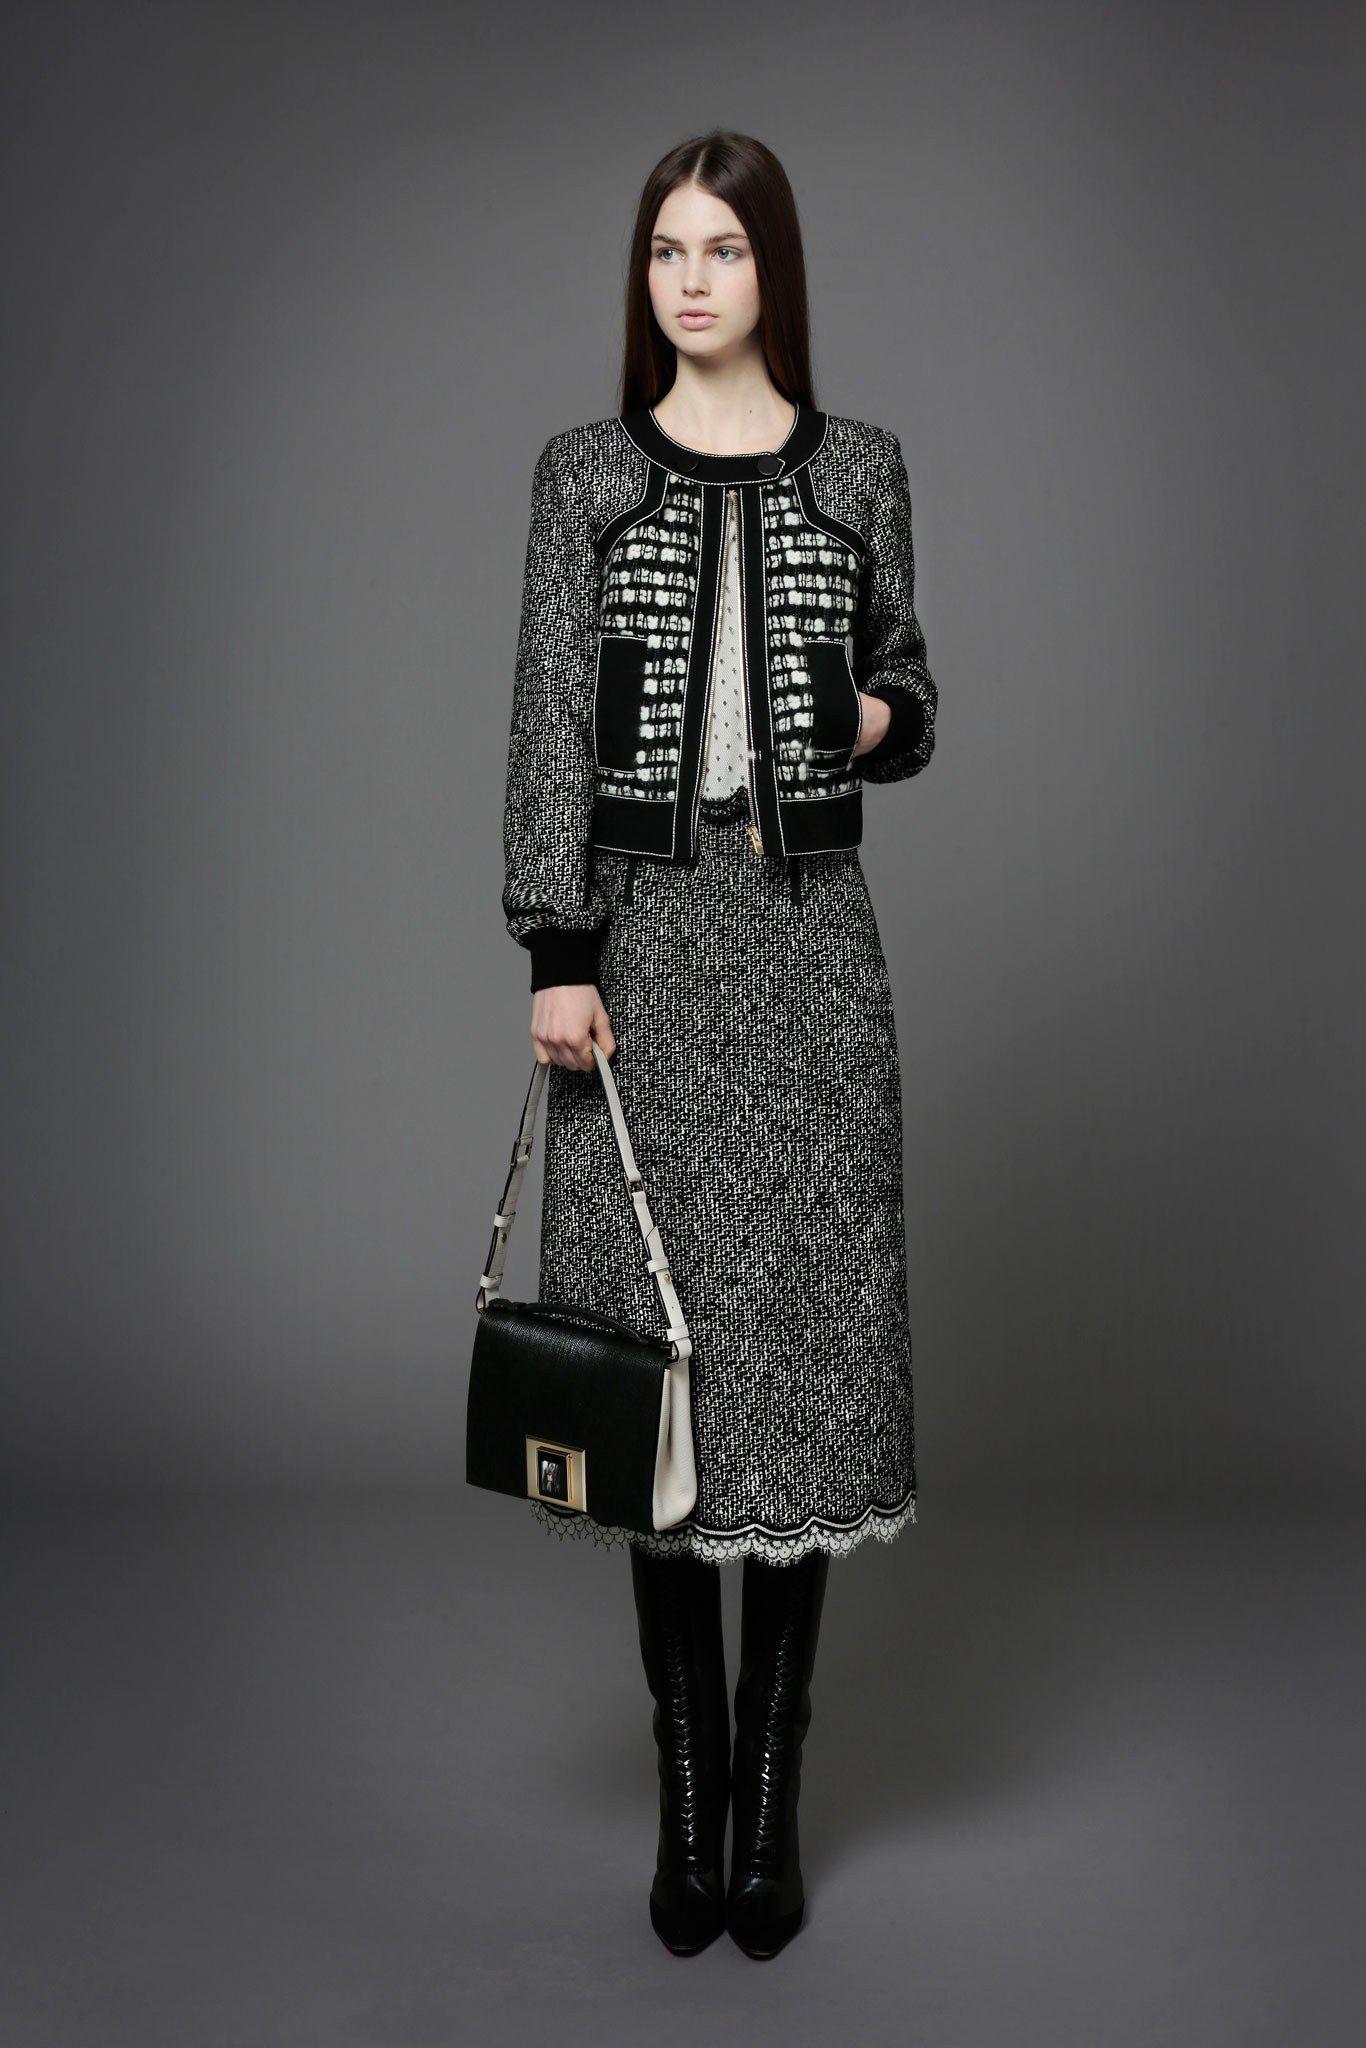 Andrew Gn Pre-Fall 2012 Fashion Show in 2020 | Fashion